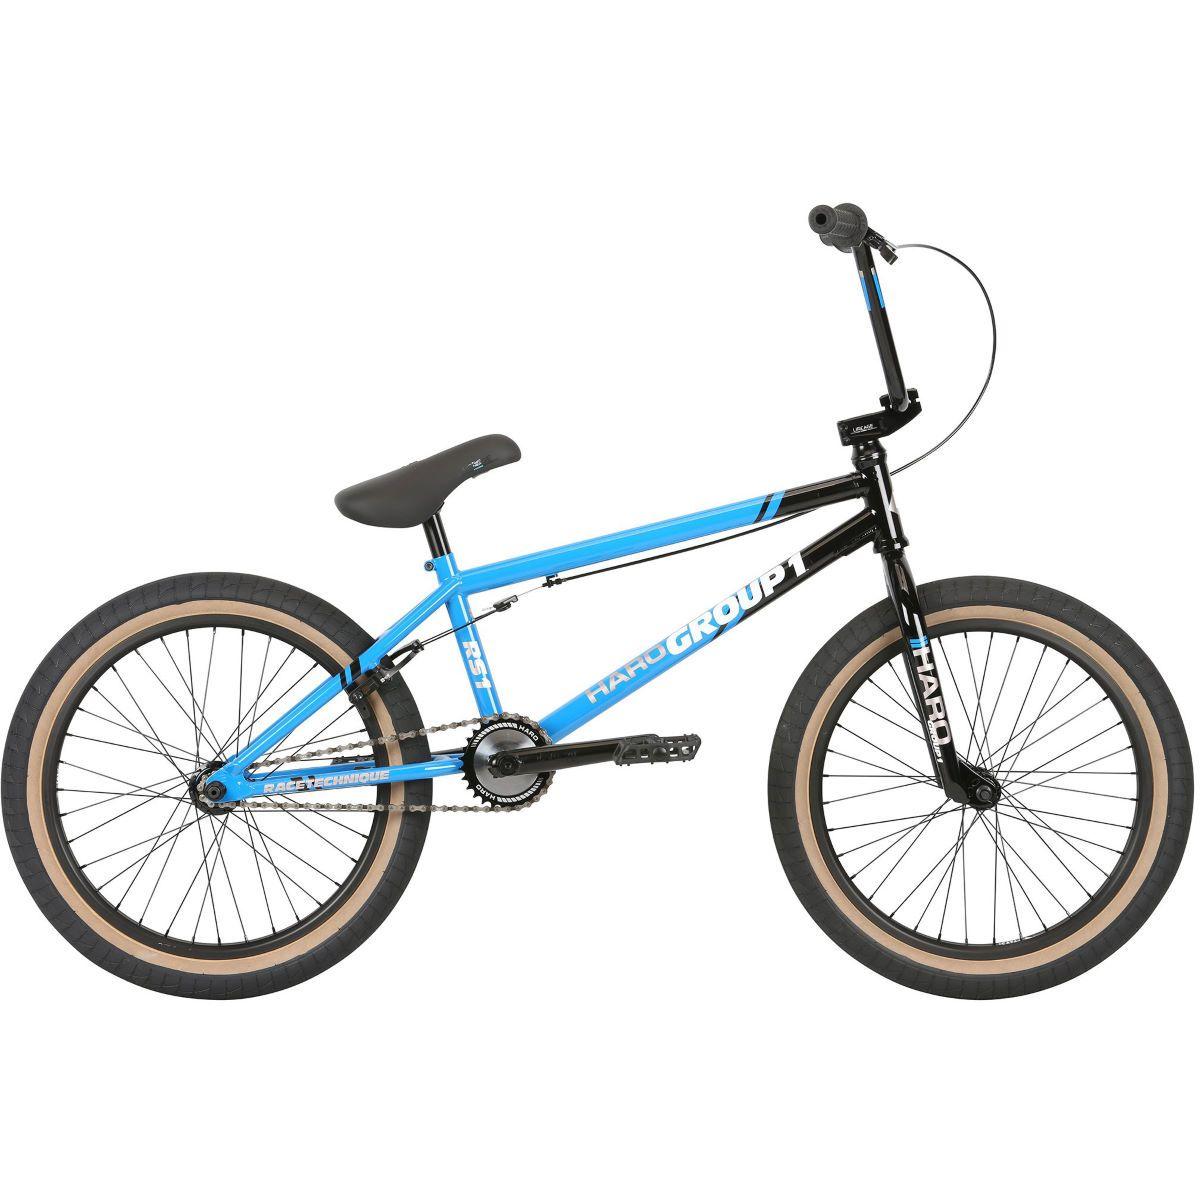 Haro Group 1 RS1 Trails BMX Bike Freestyle BMX Bikes £599